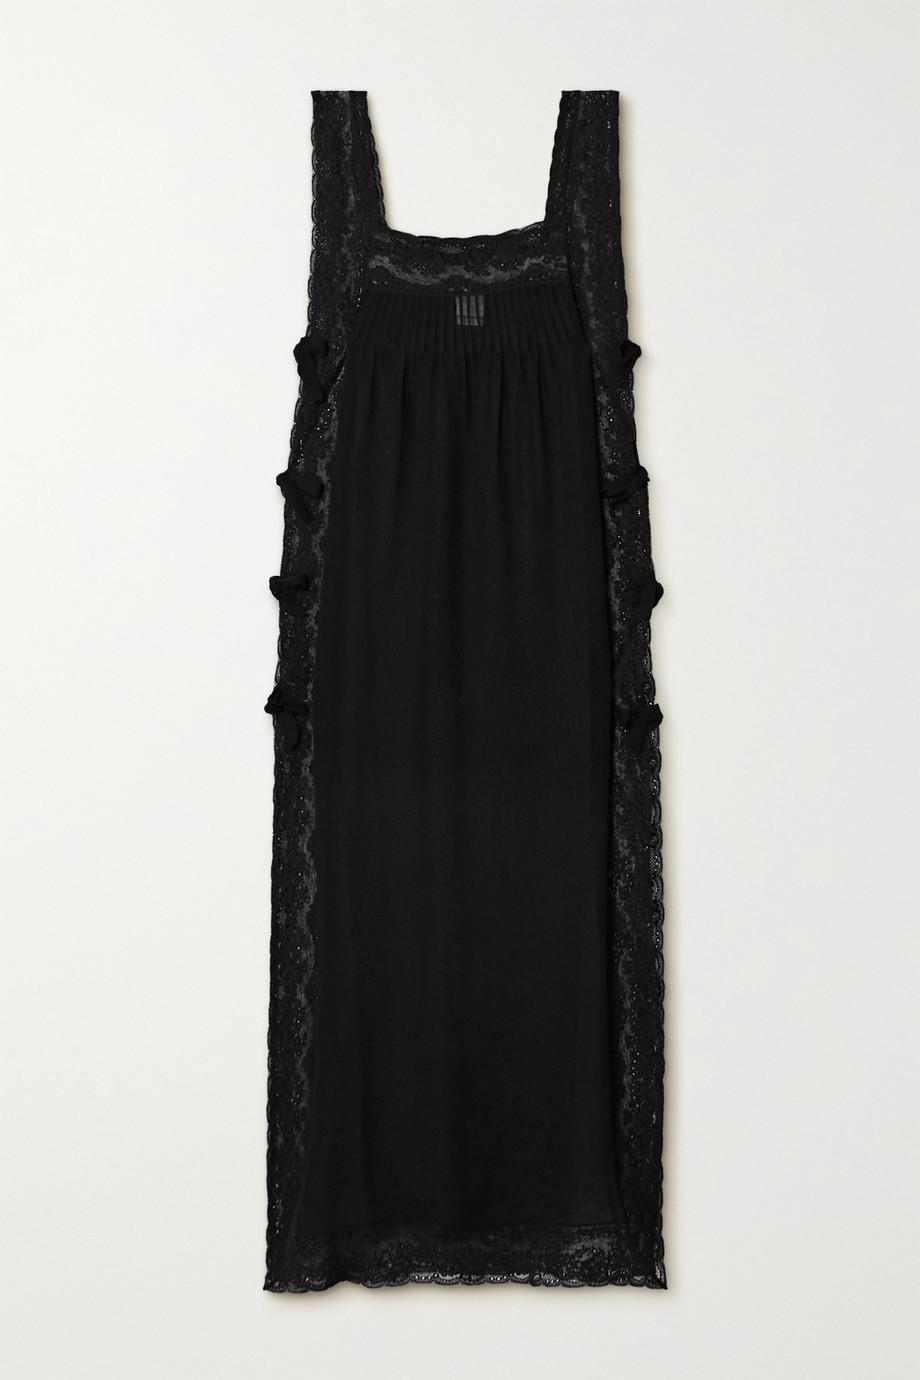 Loretta Caponi Fiocchini lace-trimmed silk-georgette nightdress